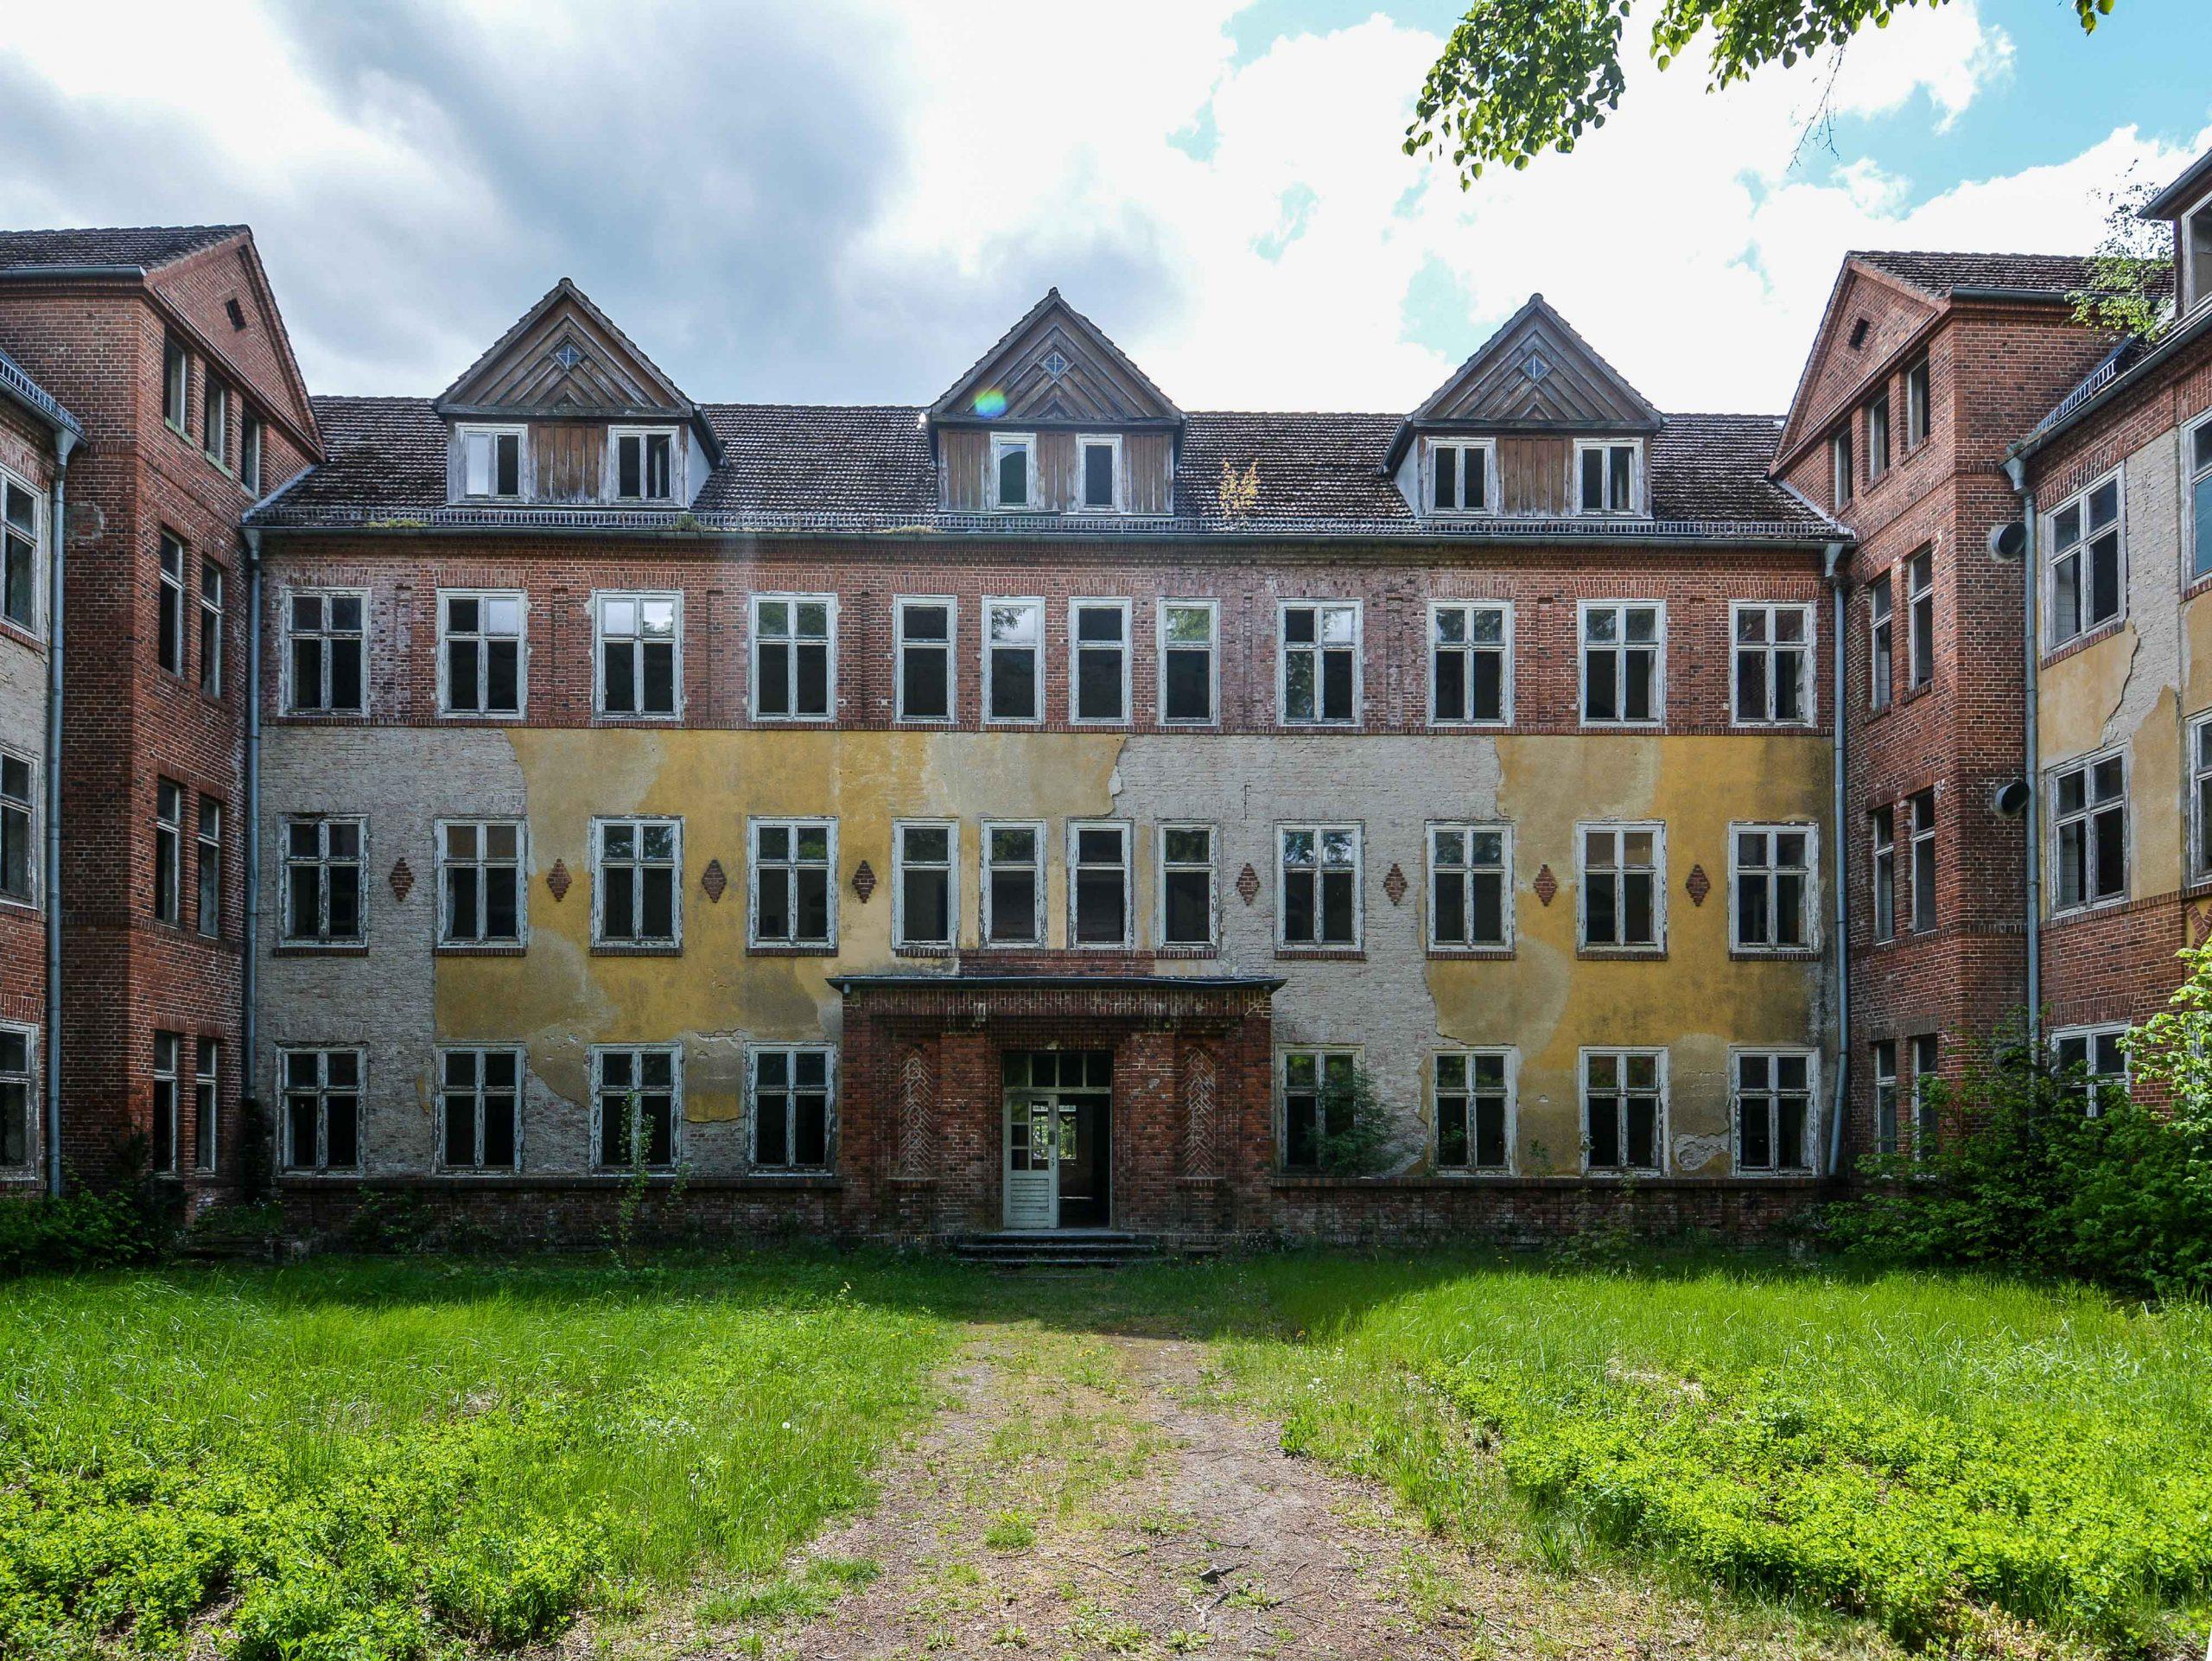 front view side entrance building sanatorium tuberkulose heilstaette grabowsee sanatorium hospital oranienburg lost places abandoned urbex brandenburg germany deutschland